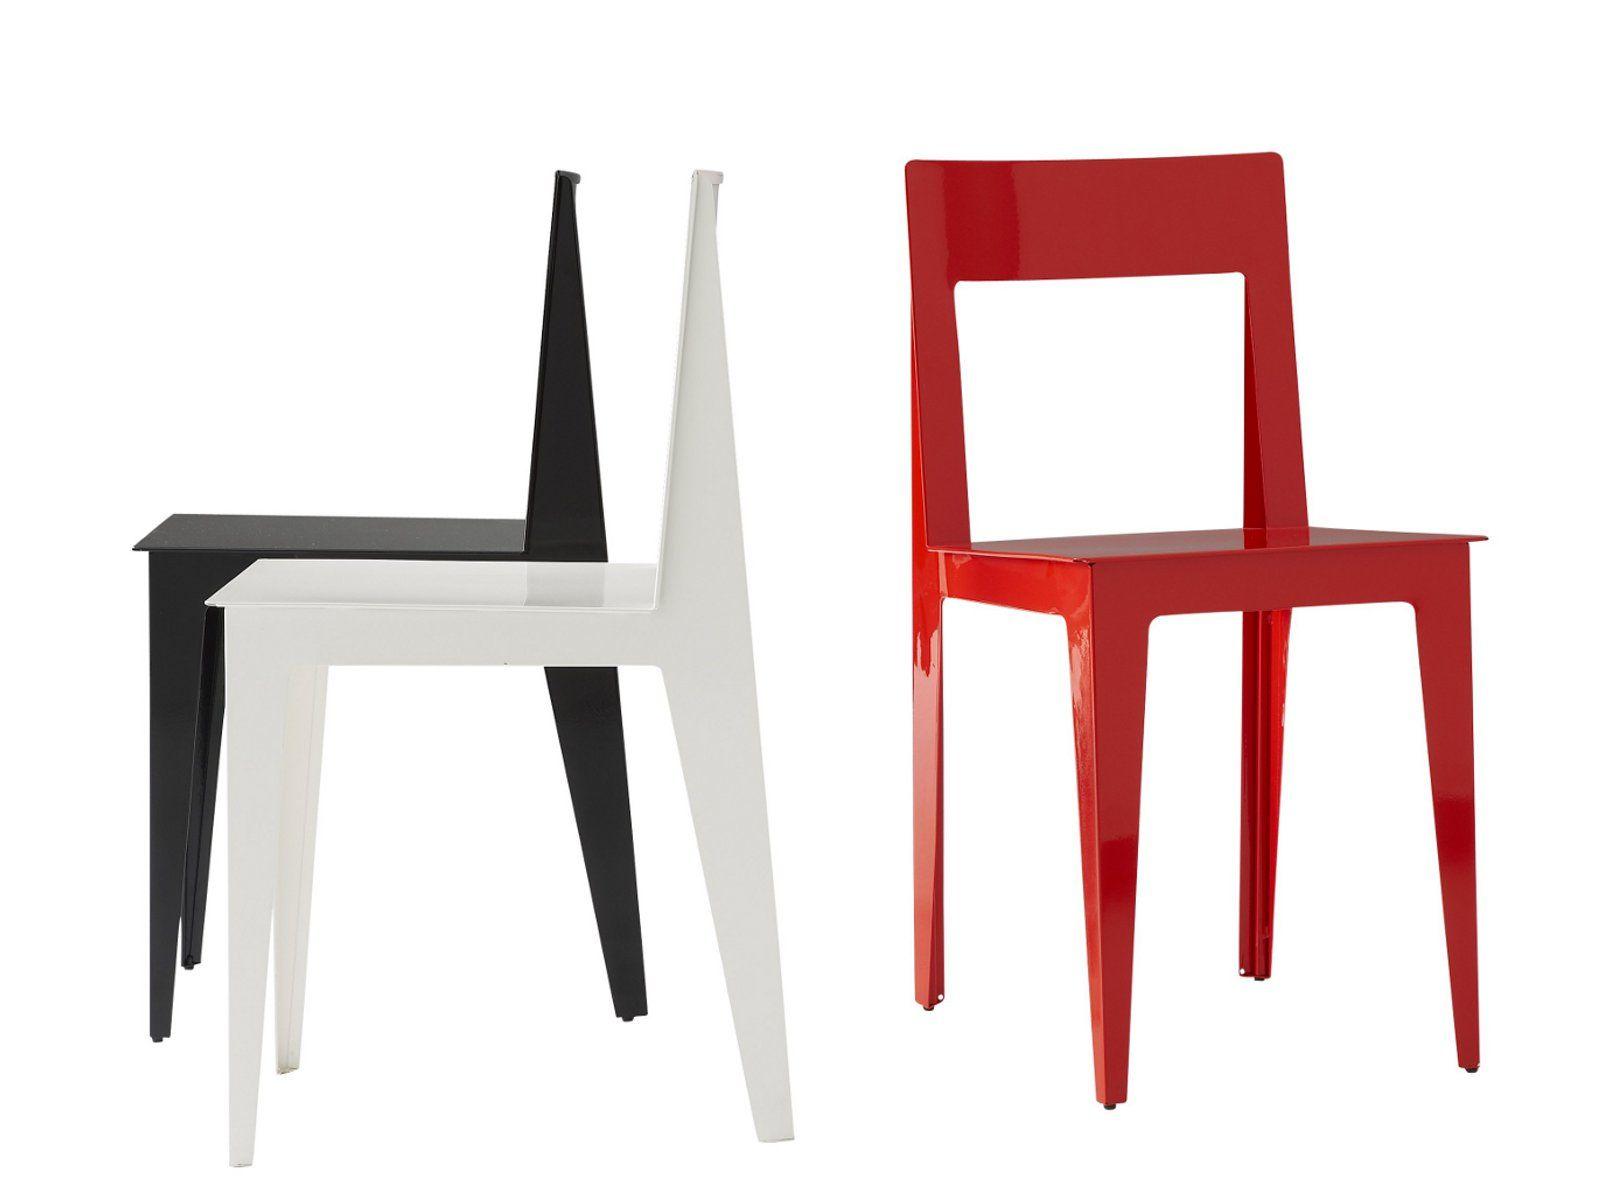 chaise en acier la pli e by roset italia design marie aurore stiker m tral. Black Bedroom Furniture Sets. Home Design Ideas